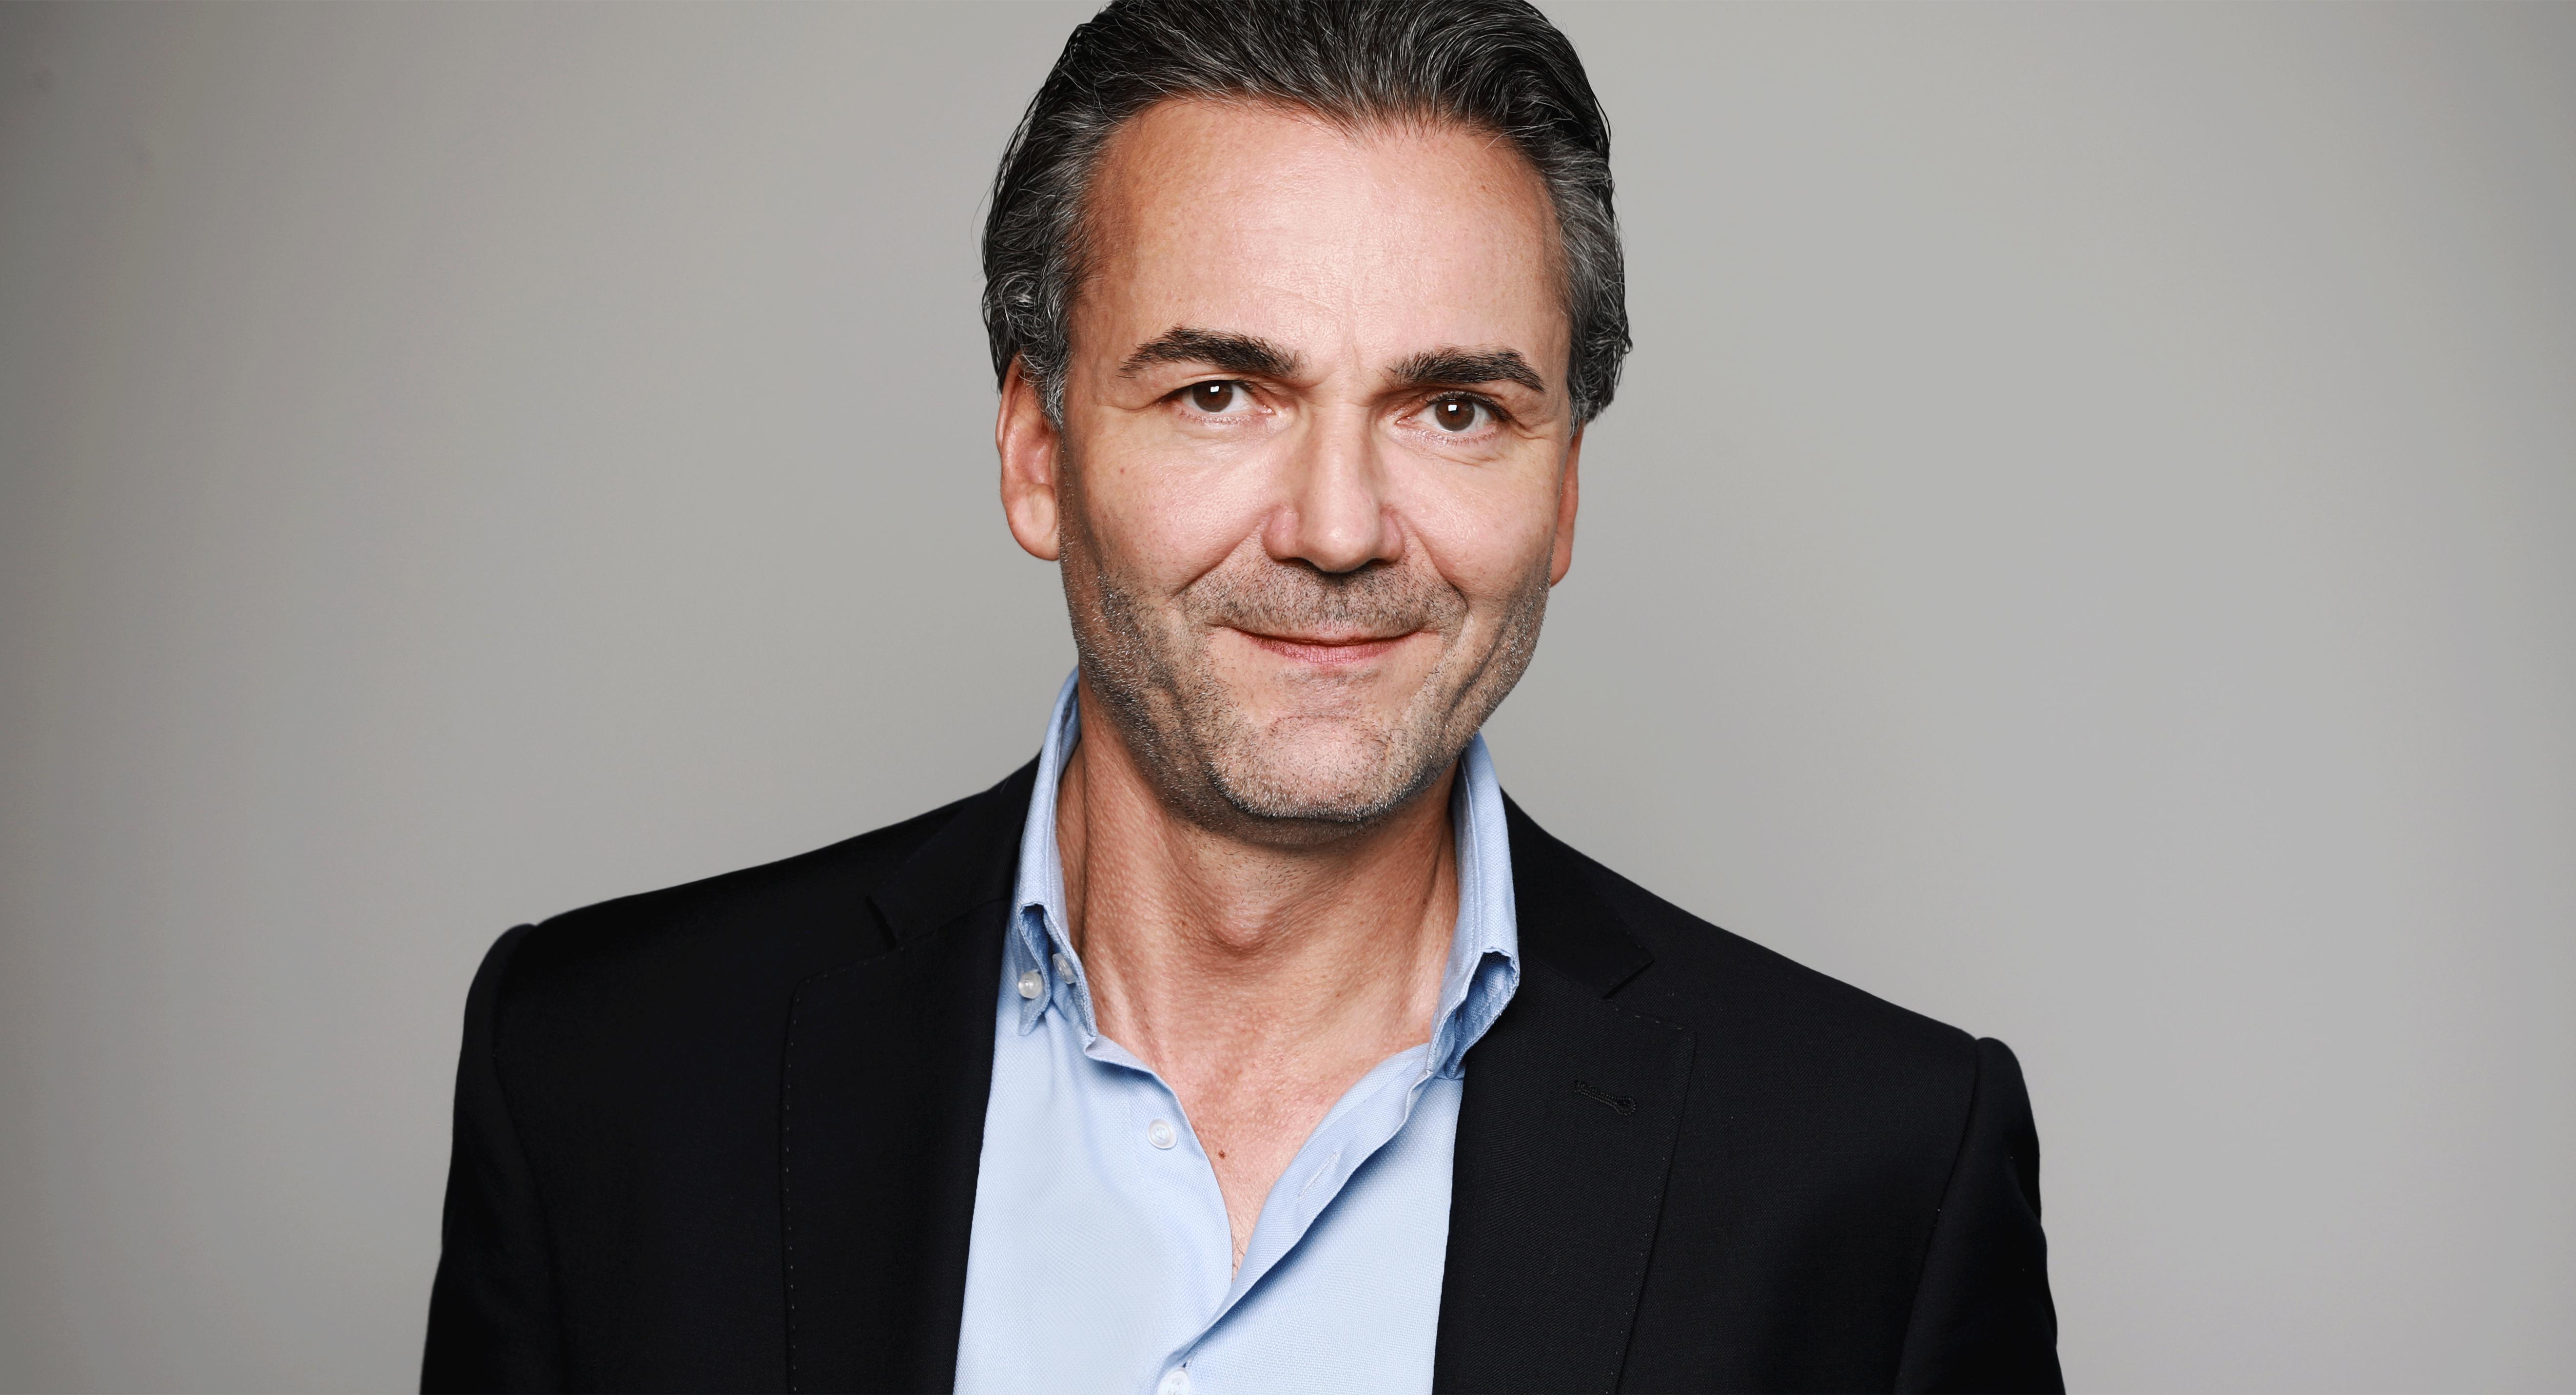 Tim Georg Pape